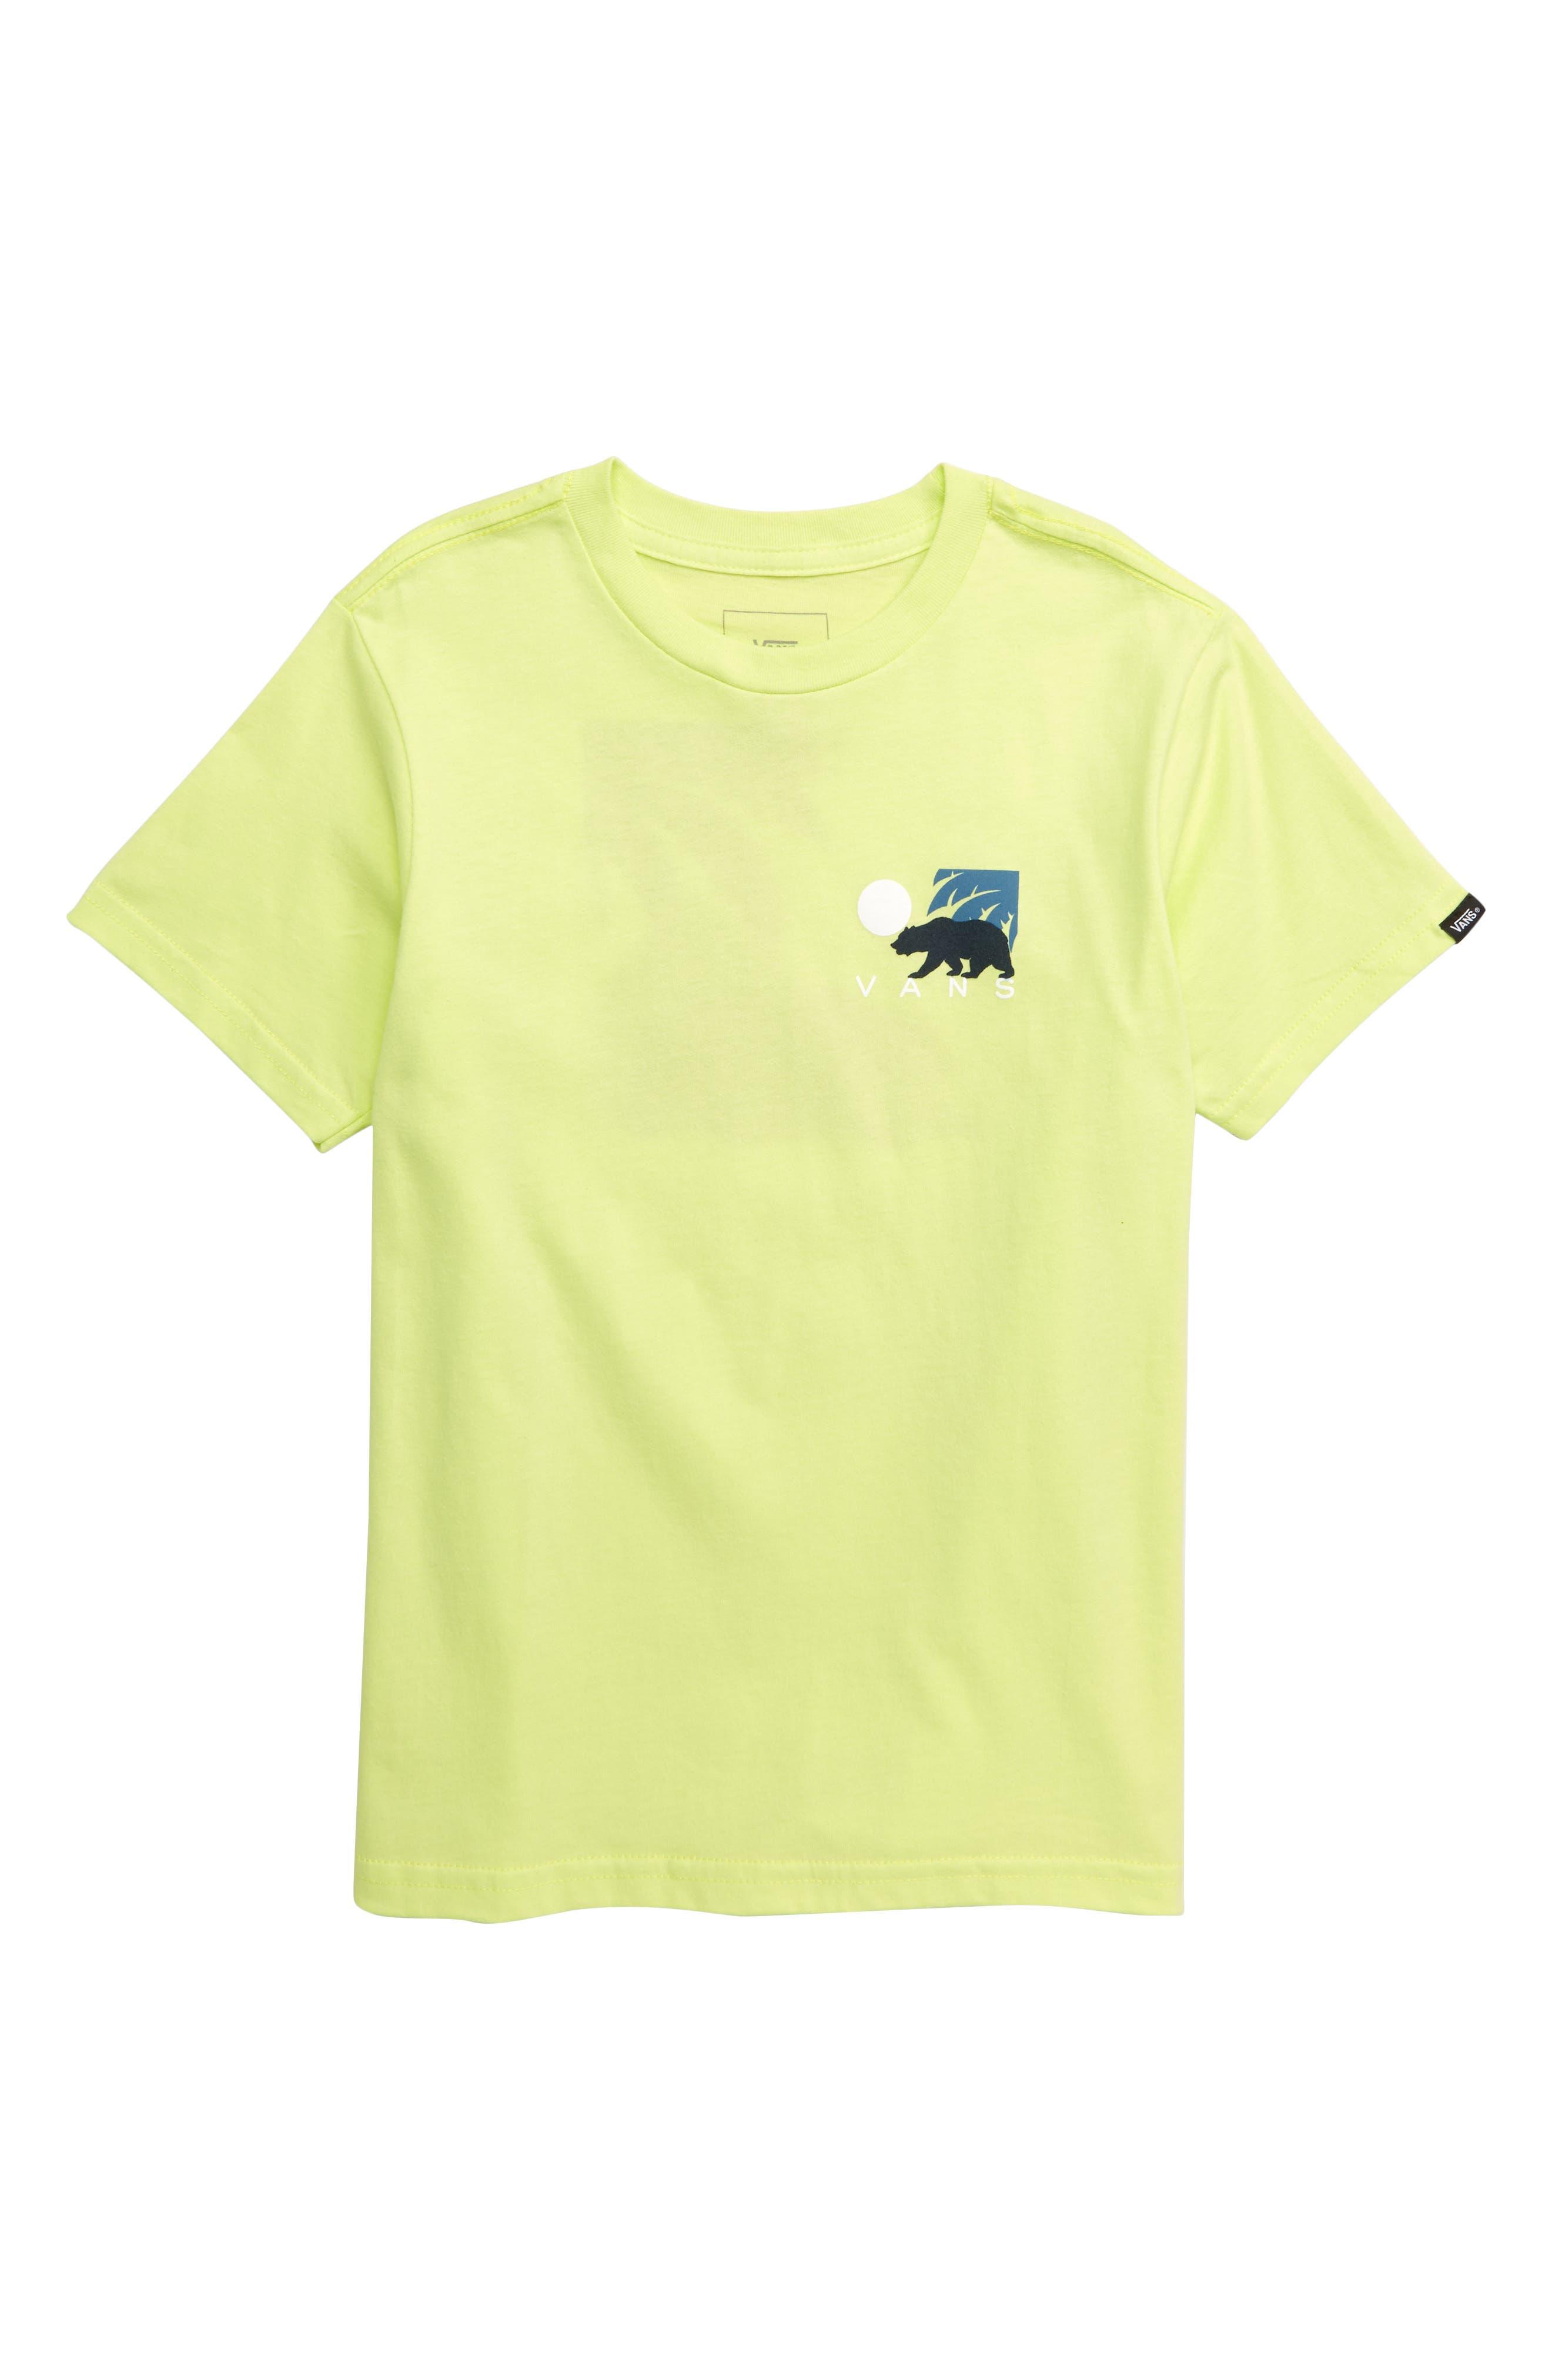 VANS, Cali Winter Graphic T-Shirt, Main thumbnail 1, color, SUNNY LIME